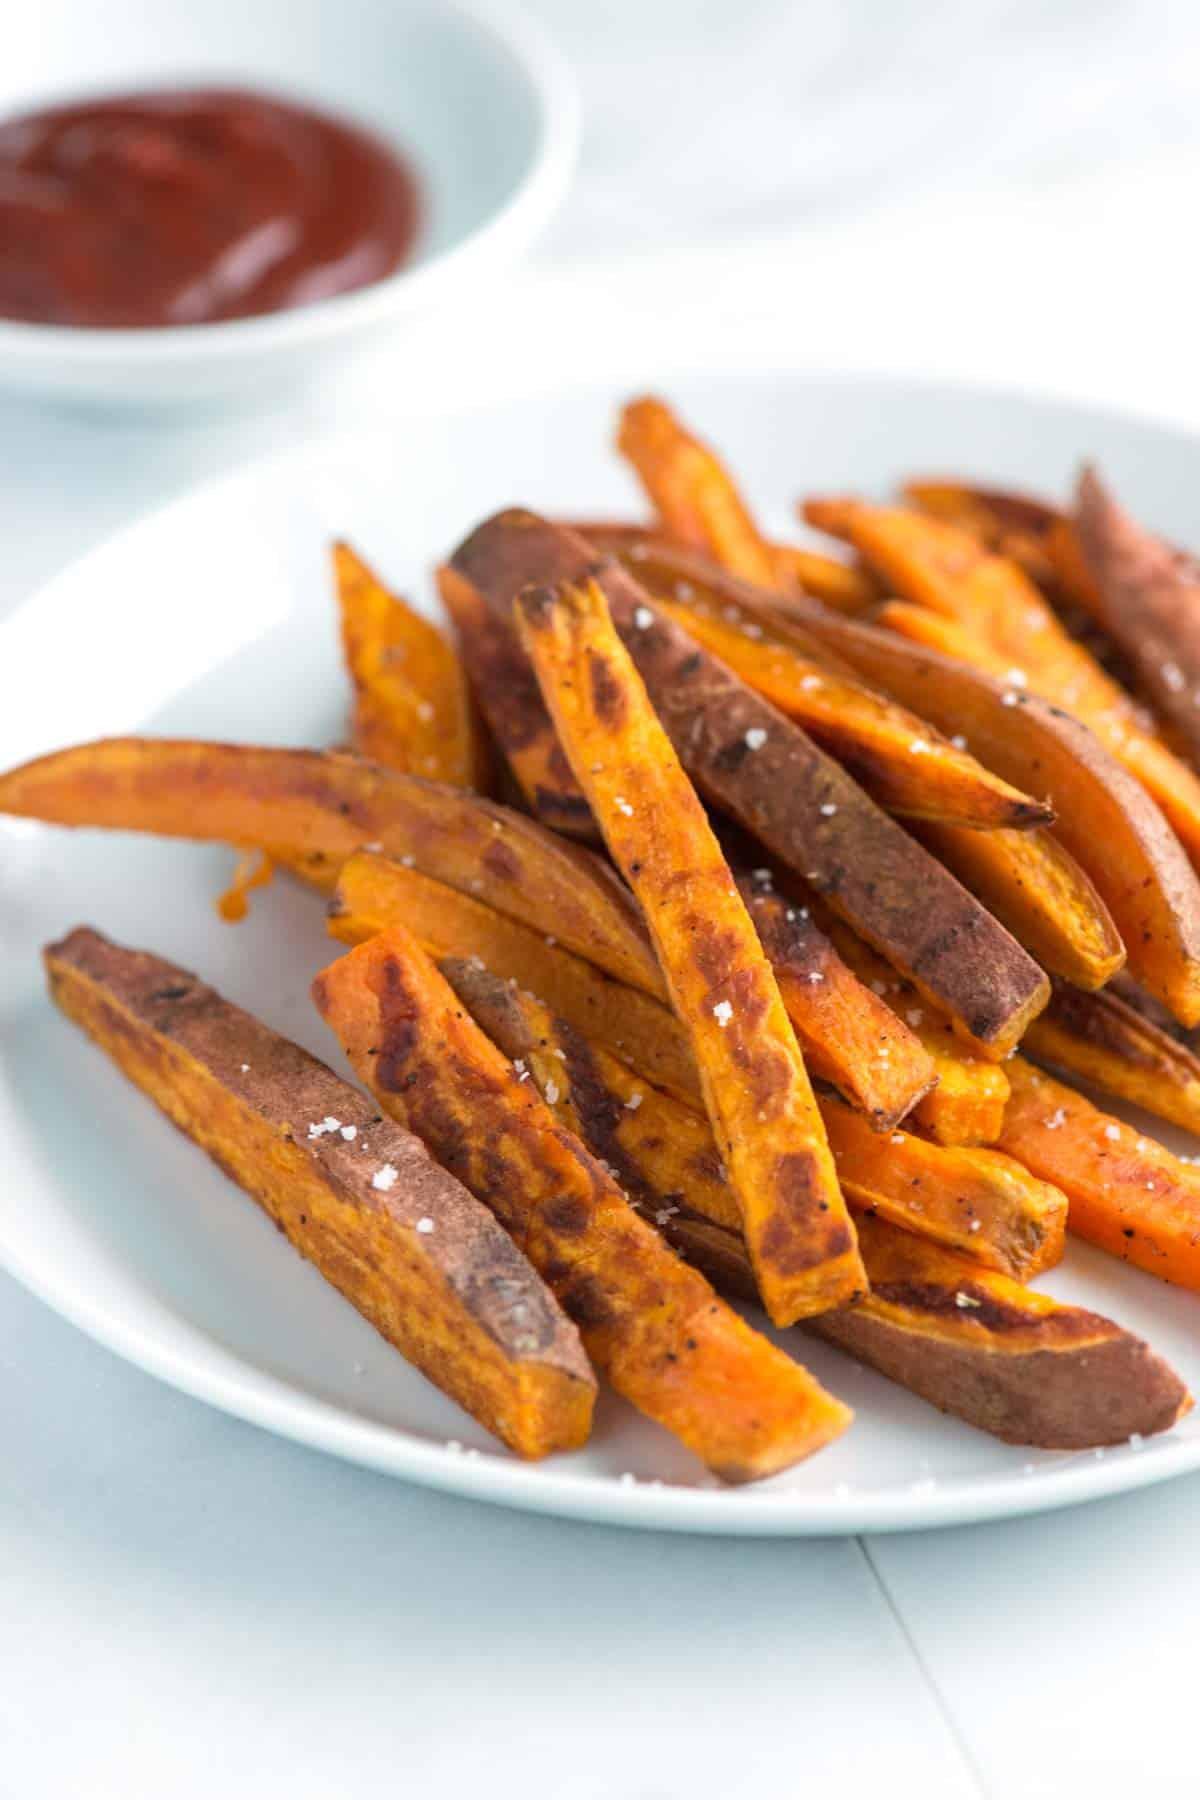 Sweet Potato Oven Fries  Easy Homemade Baked Sweet Potato Fries Recipe